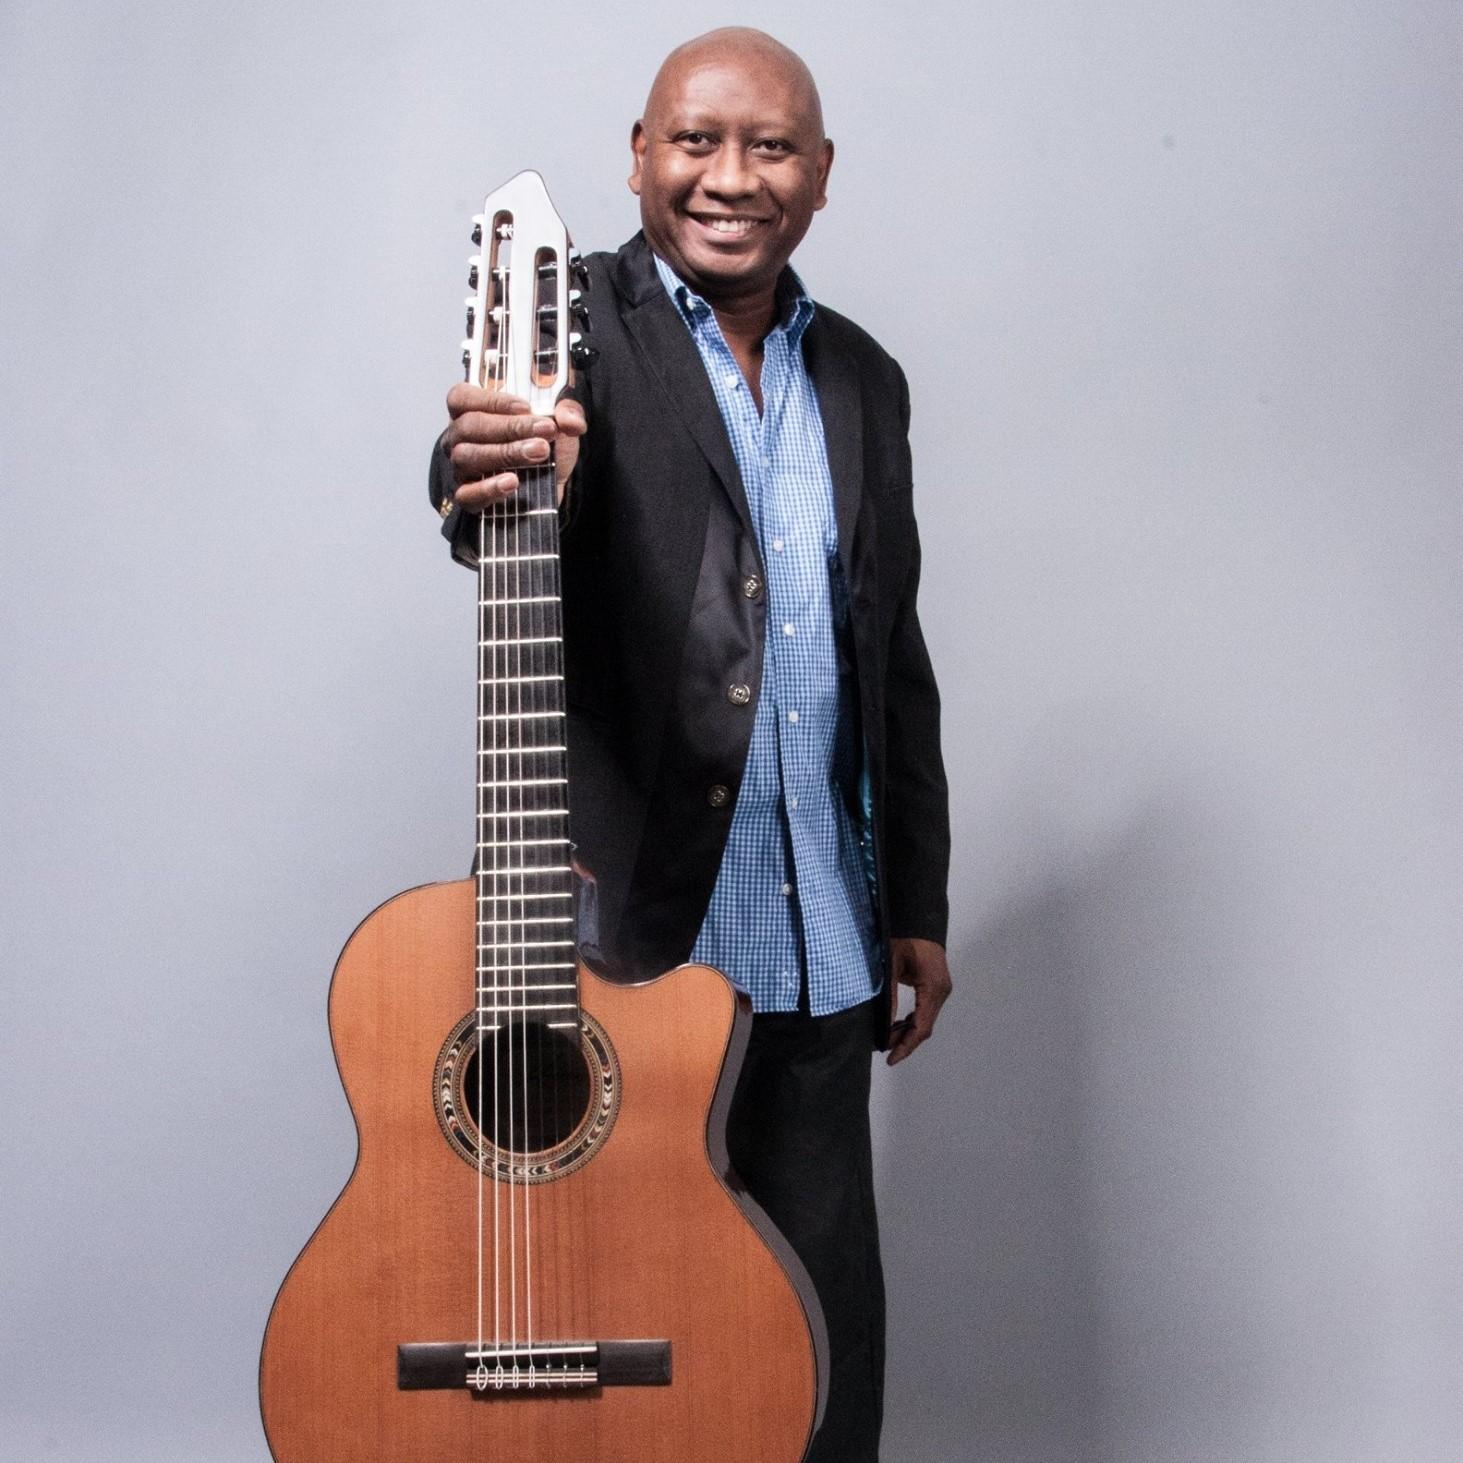 Ron Jackson Acoustic Guitar 1.jpg